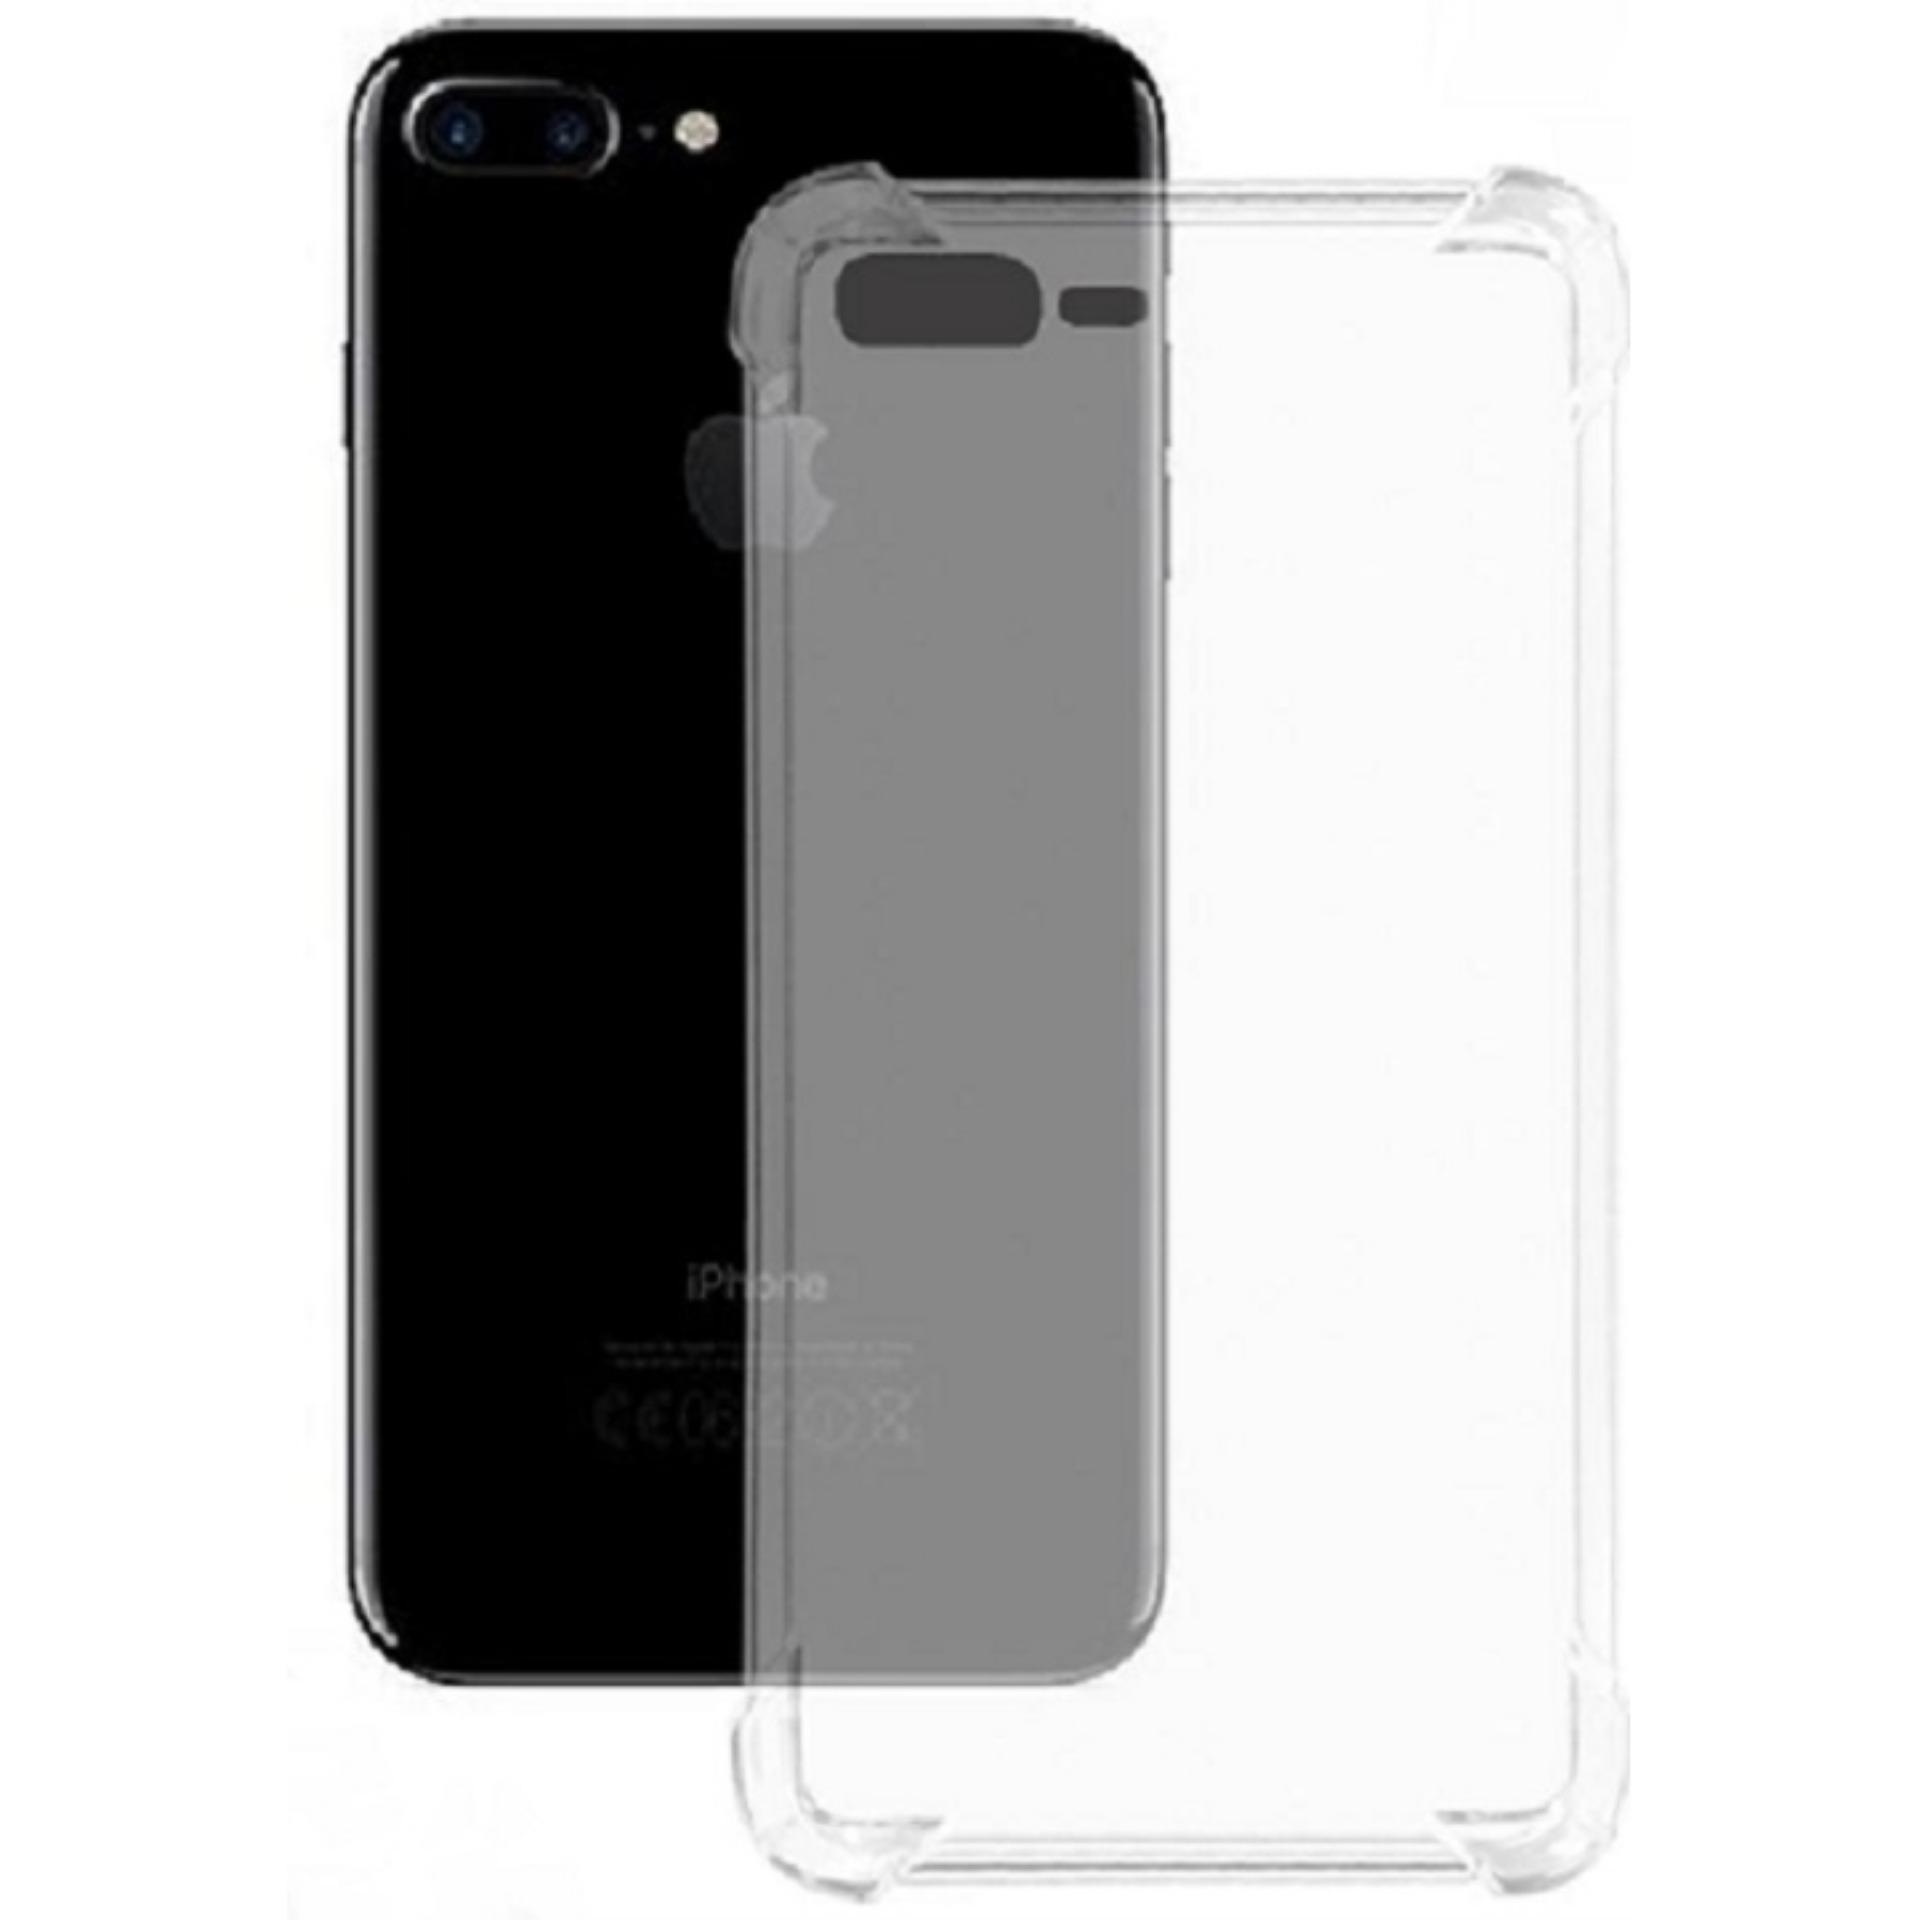 Cek Harga Baru Shockcase For Huawei Y7 Prime Holly 4 Plus Enjoys 7 Anti Crack Case Iphone Apple 8 8s Premium Softcase Jelly Shockproof